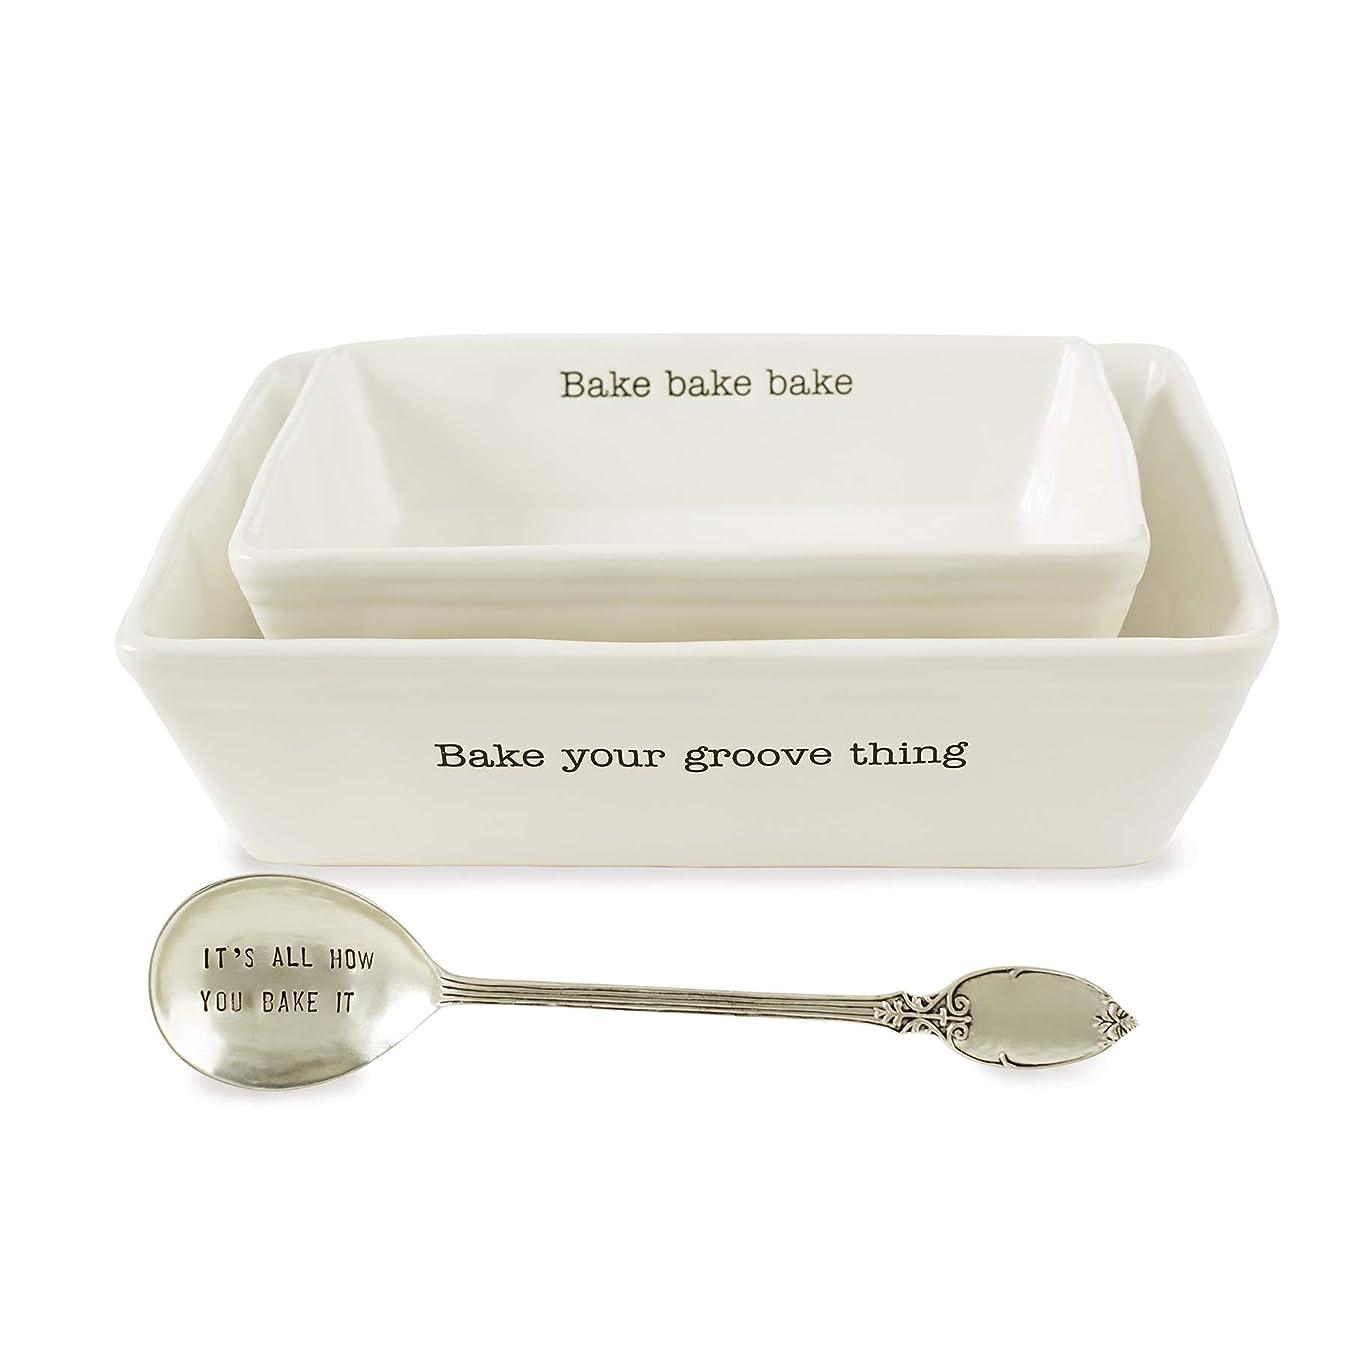 Mud Pie 48010008 Farmhouse Inspired Set of 2 Serving Spoon Baking Dish Set, One Size, White